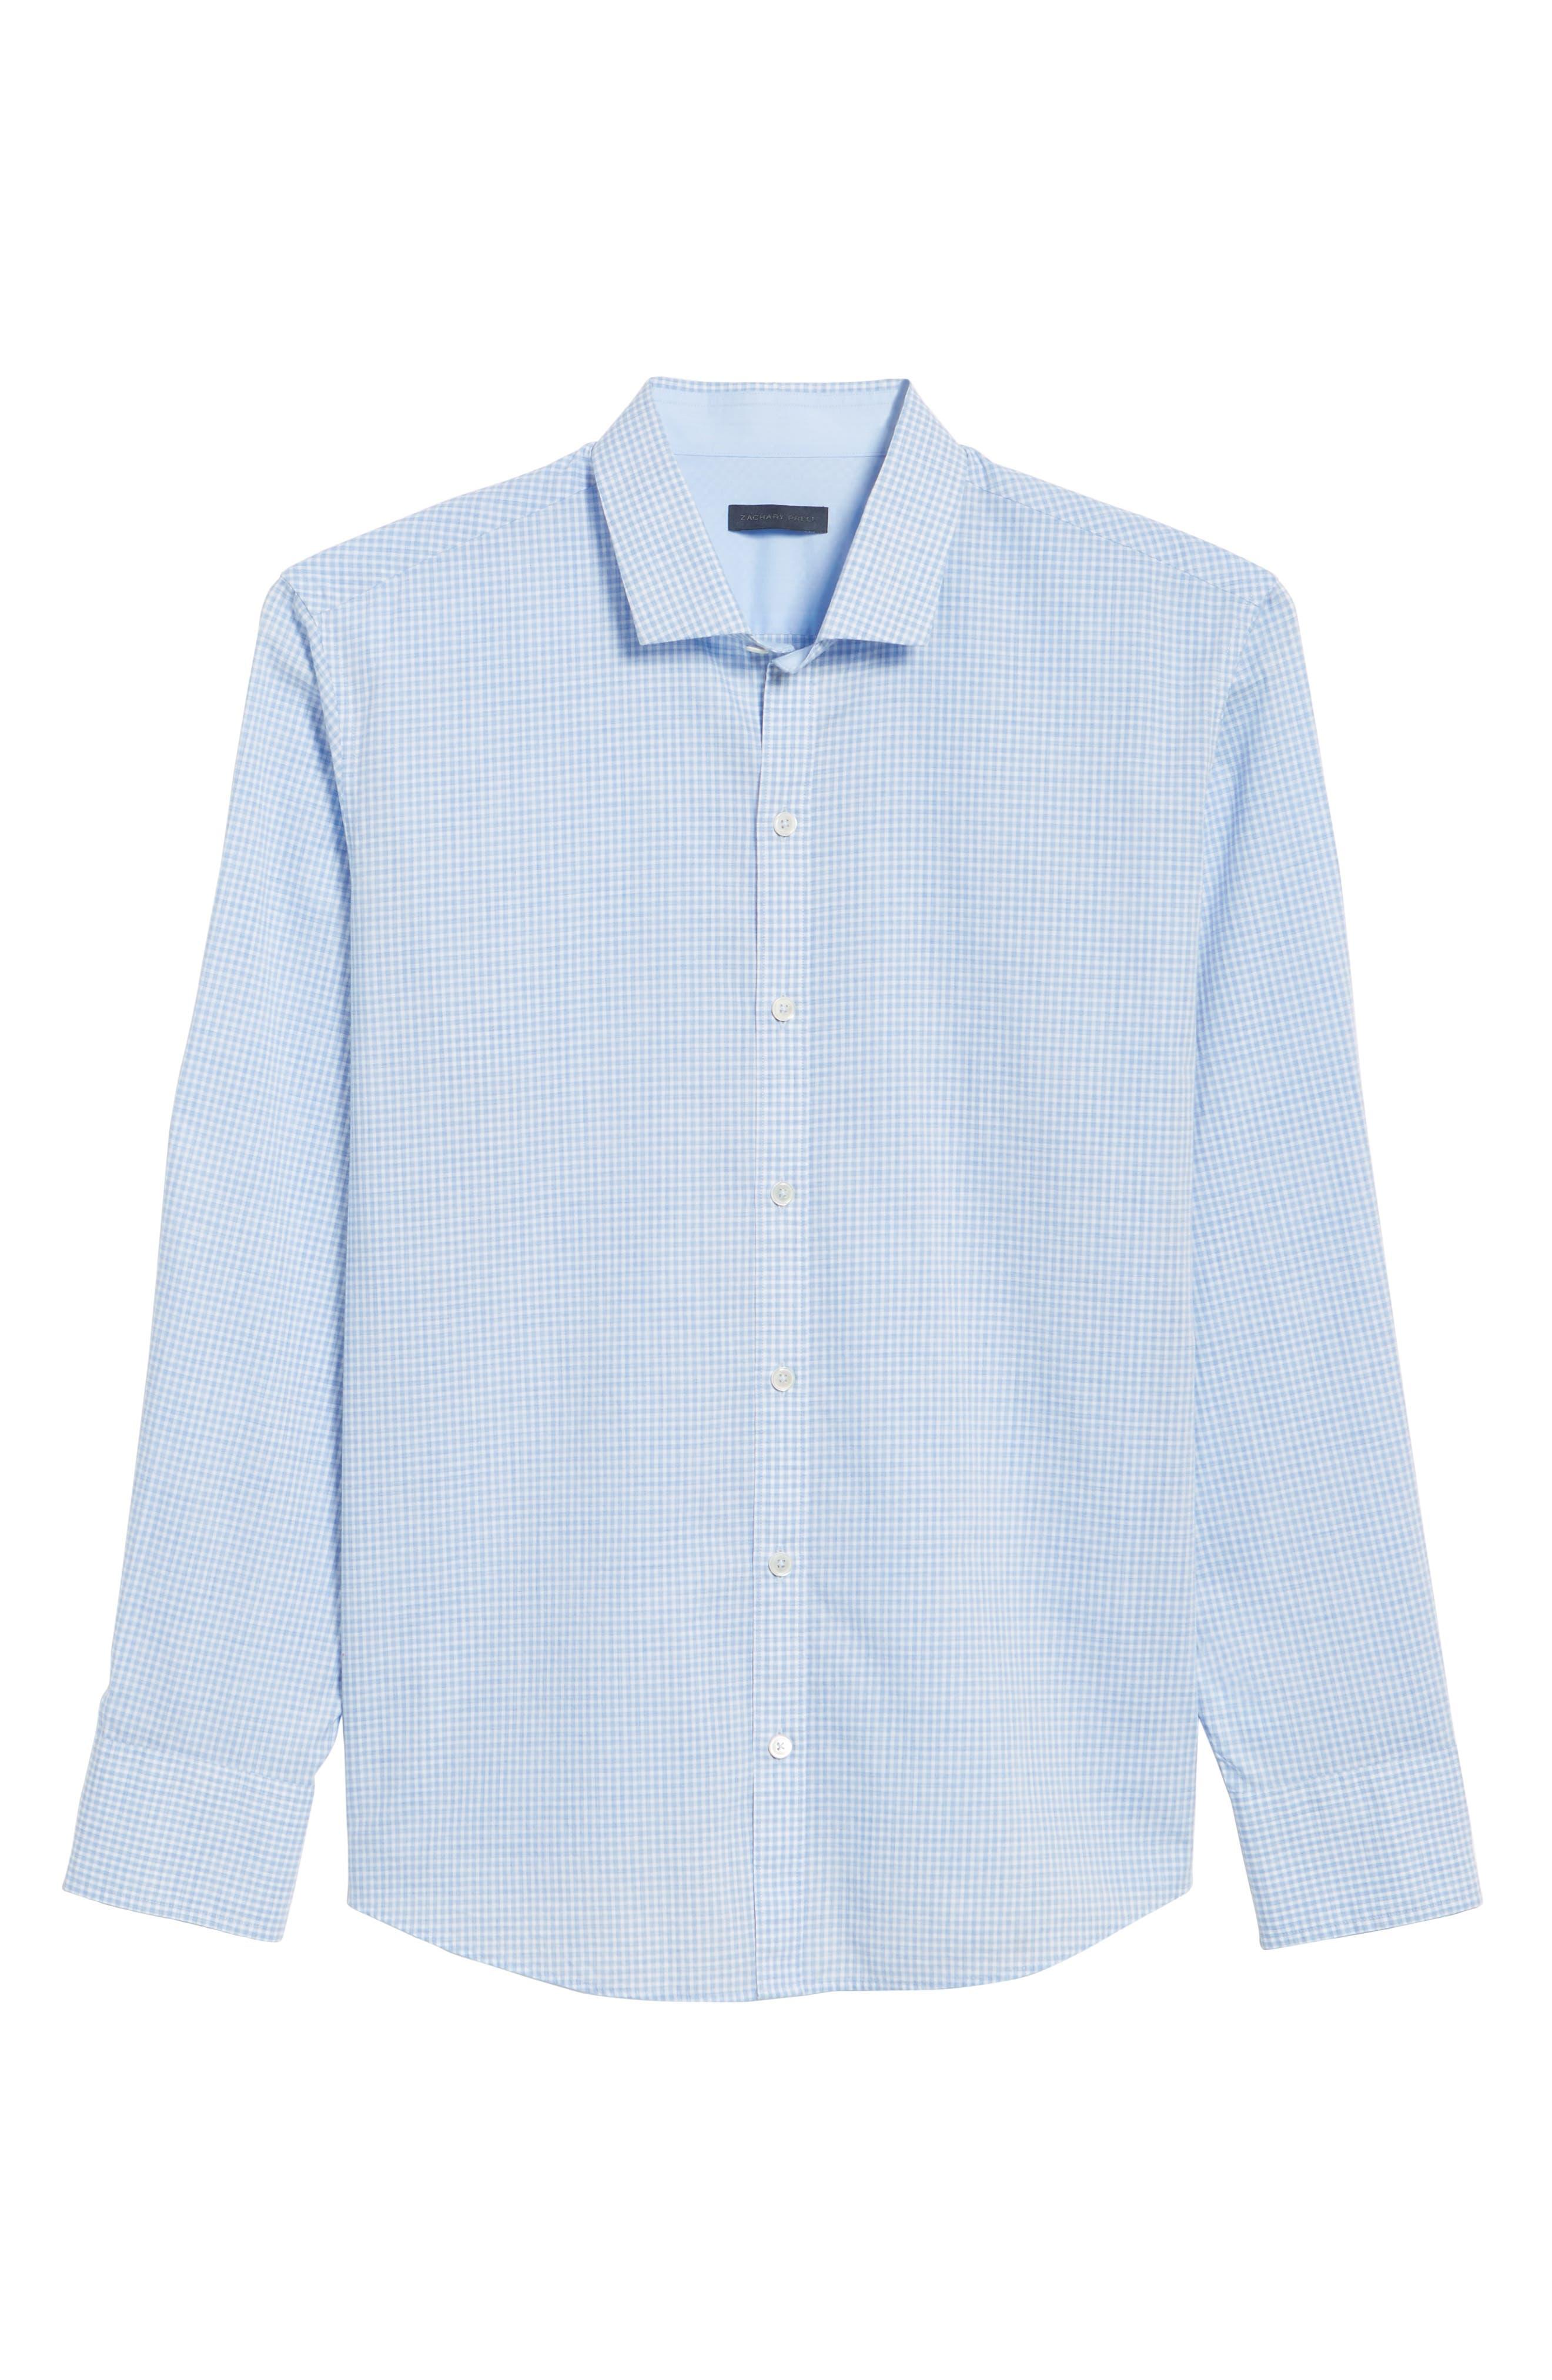 McGarry Gingham Sport Shirt,                             Alternate thumbnail 6, color,                             450